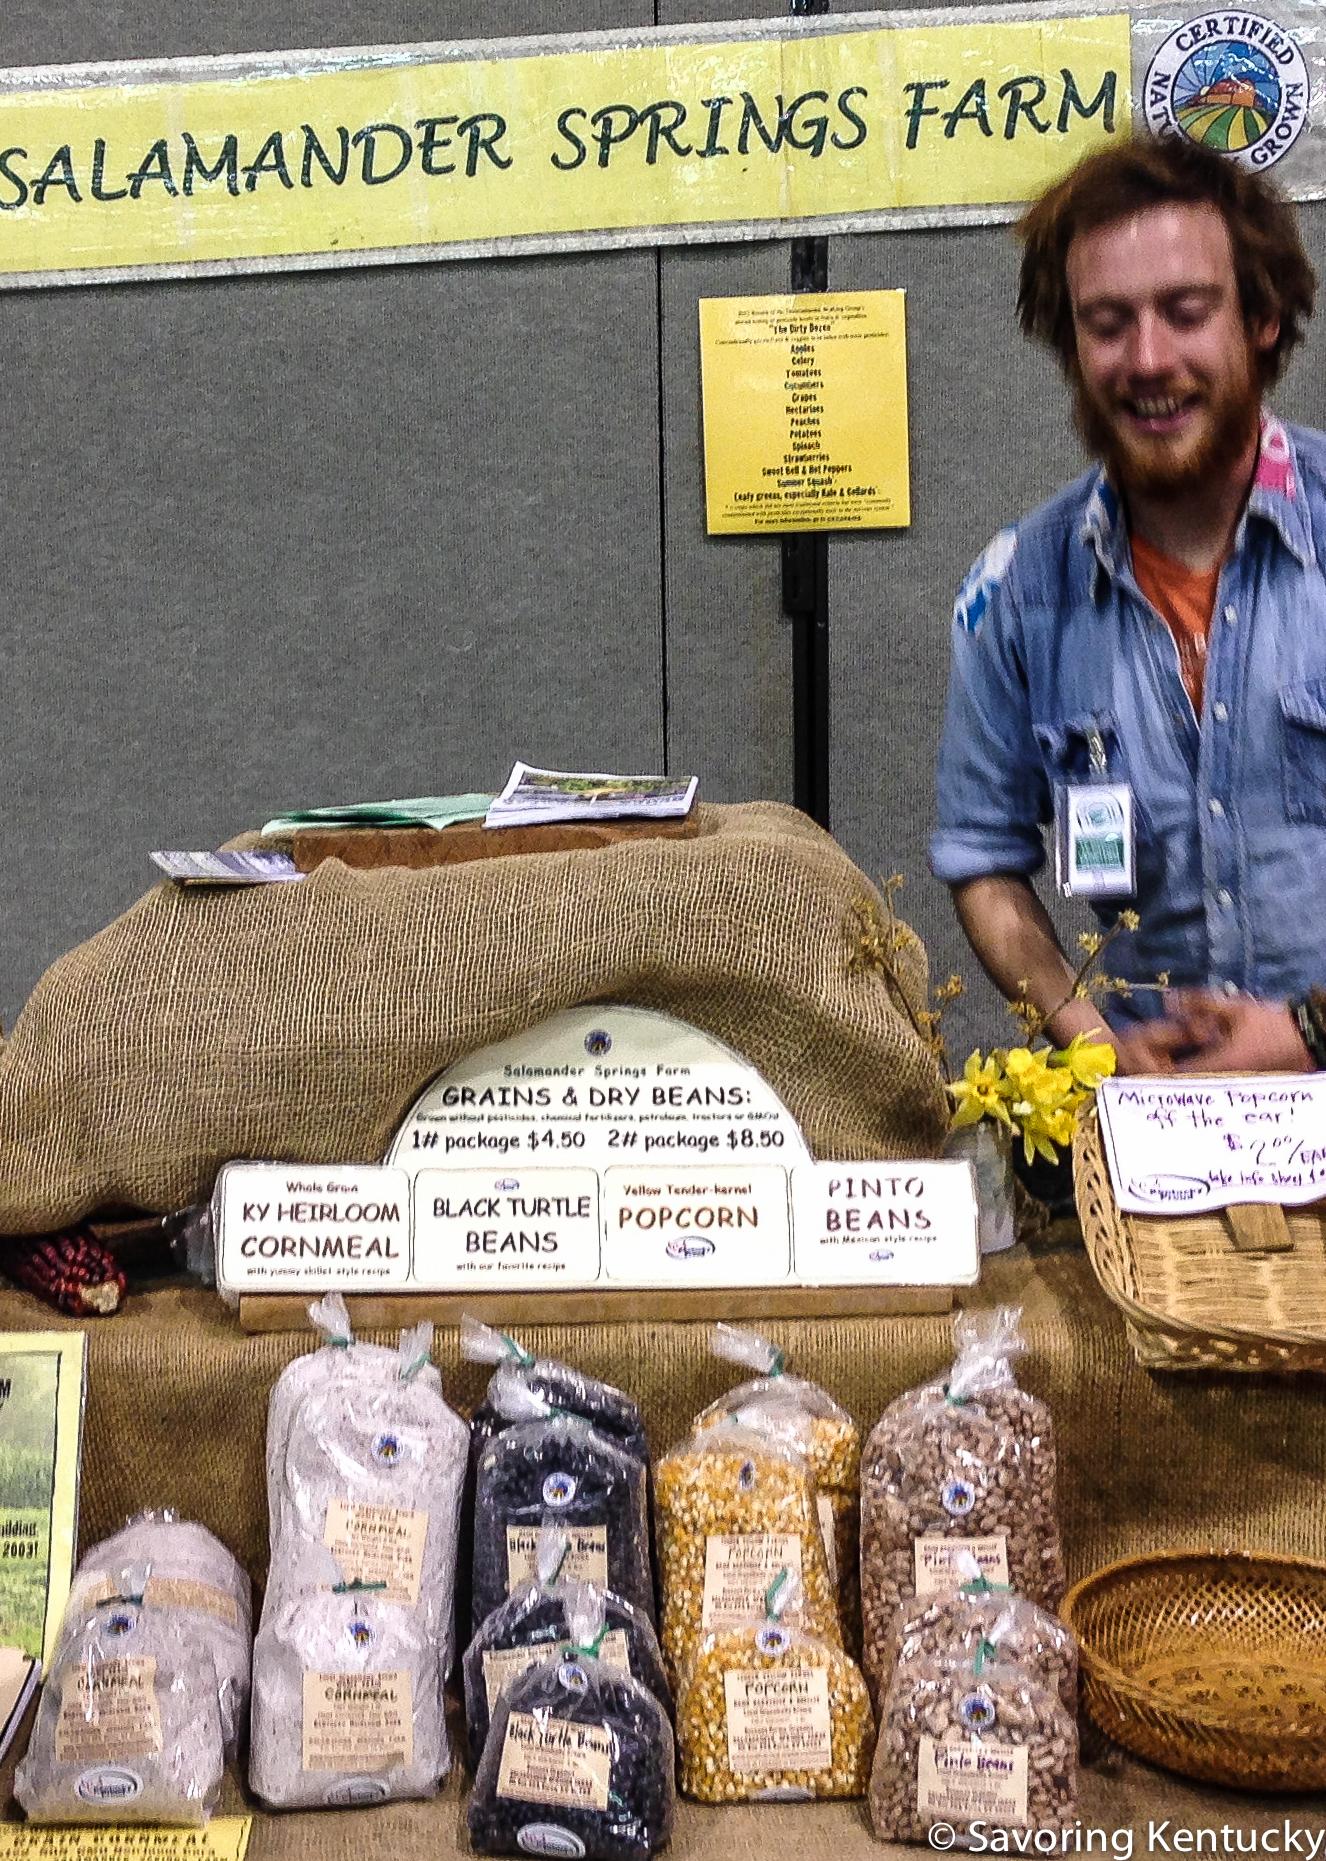 Salamander Springs Farm exhibit at at the 2014 Kentucky Green Living Fair, Somerset, Kentucky